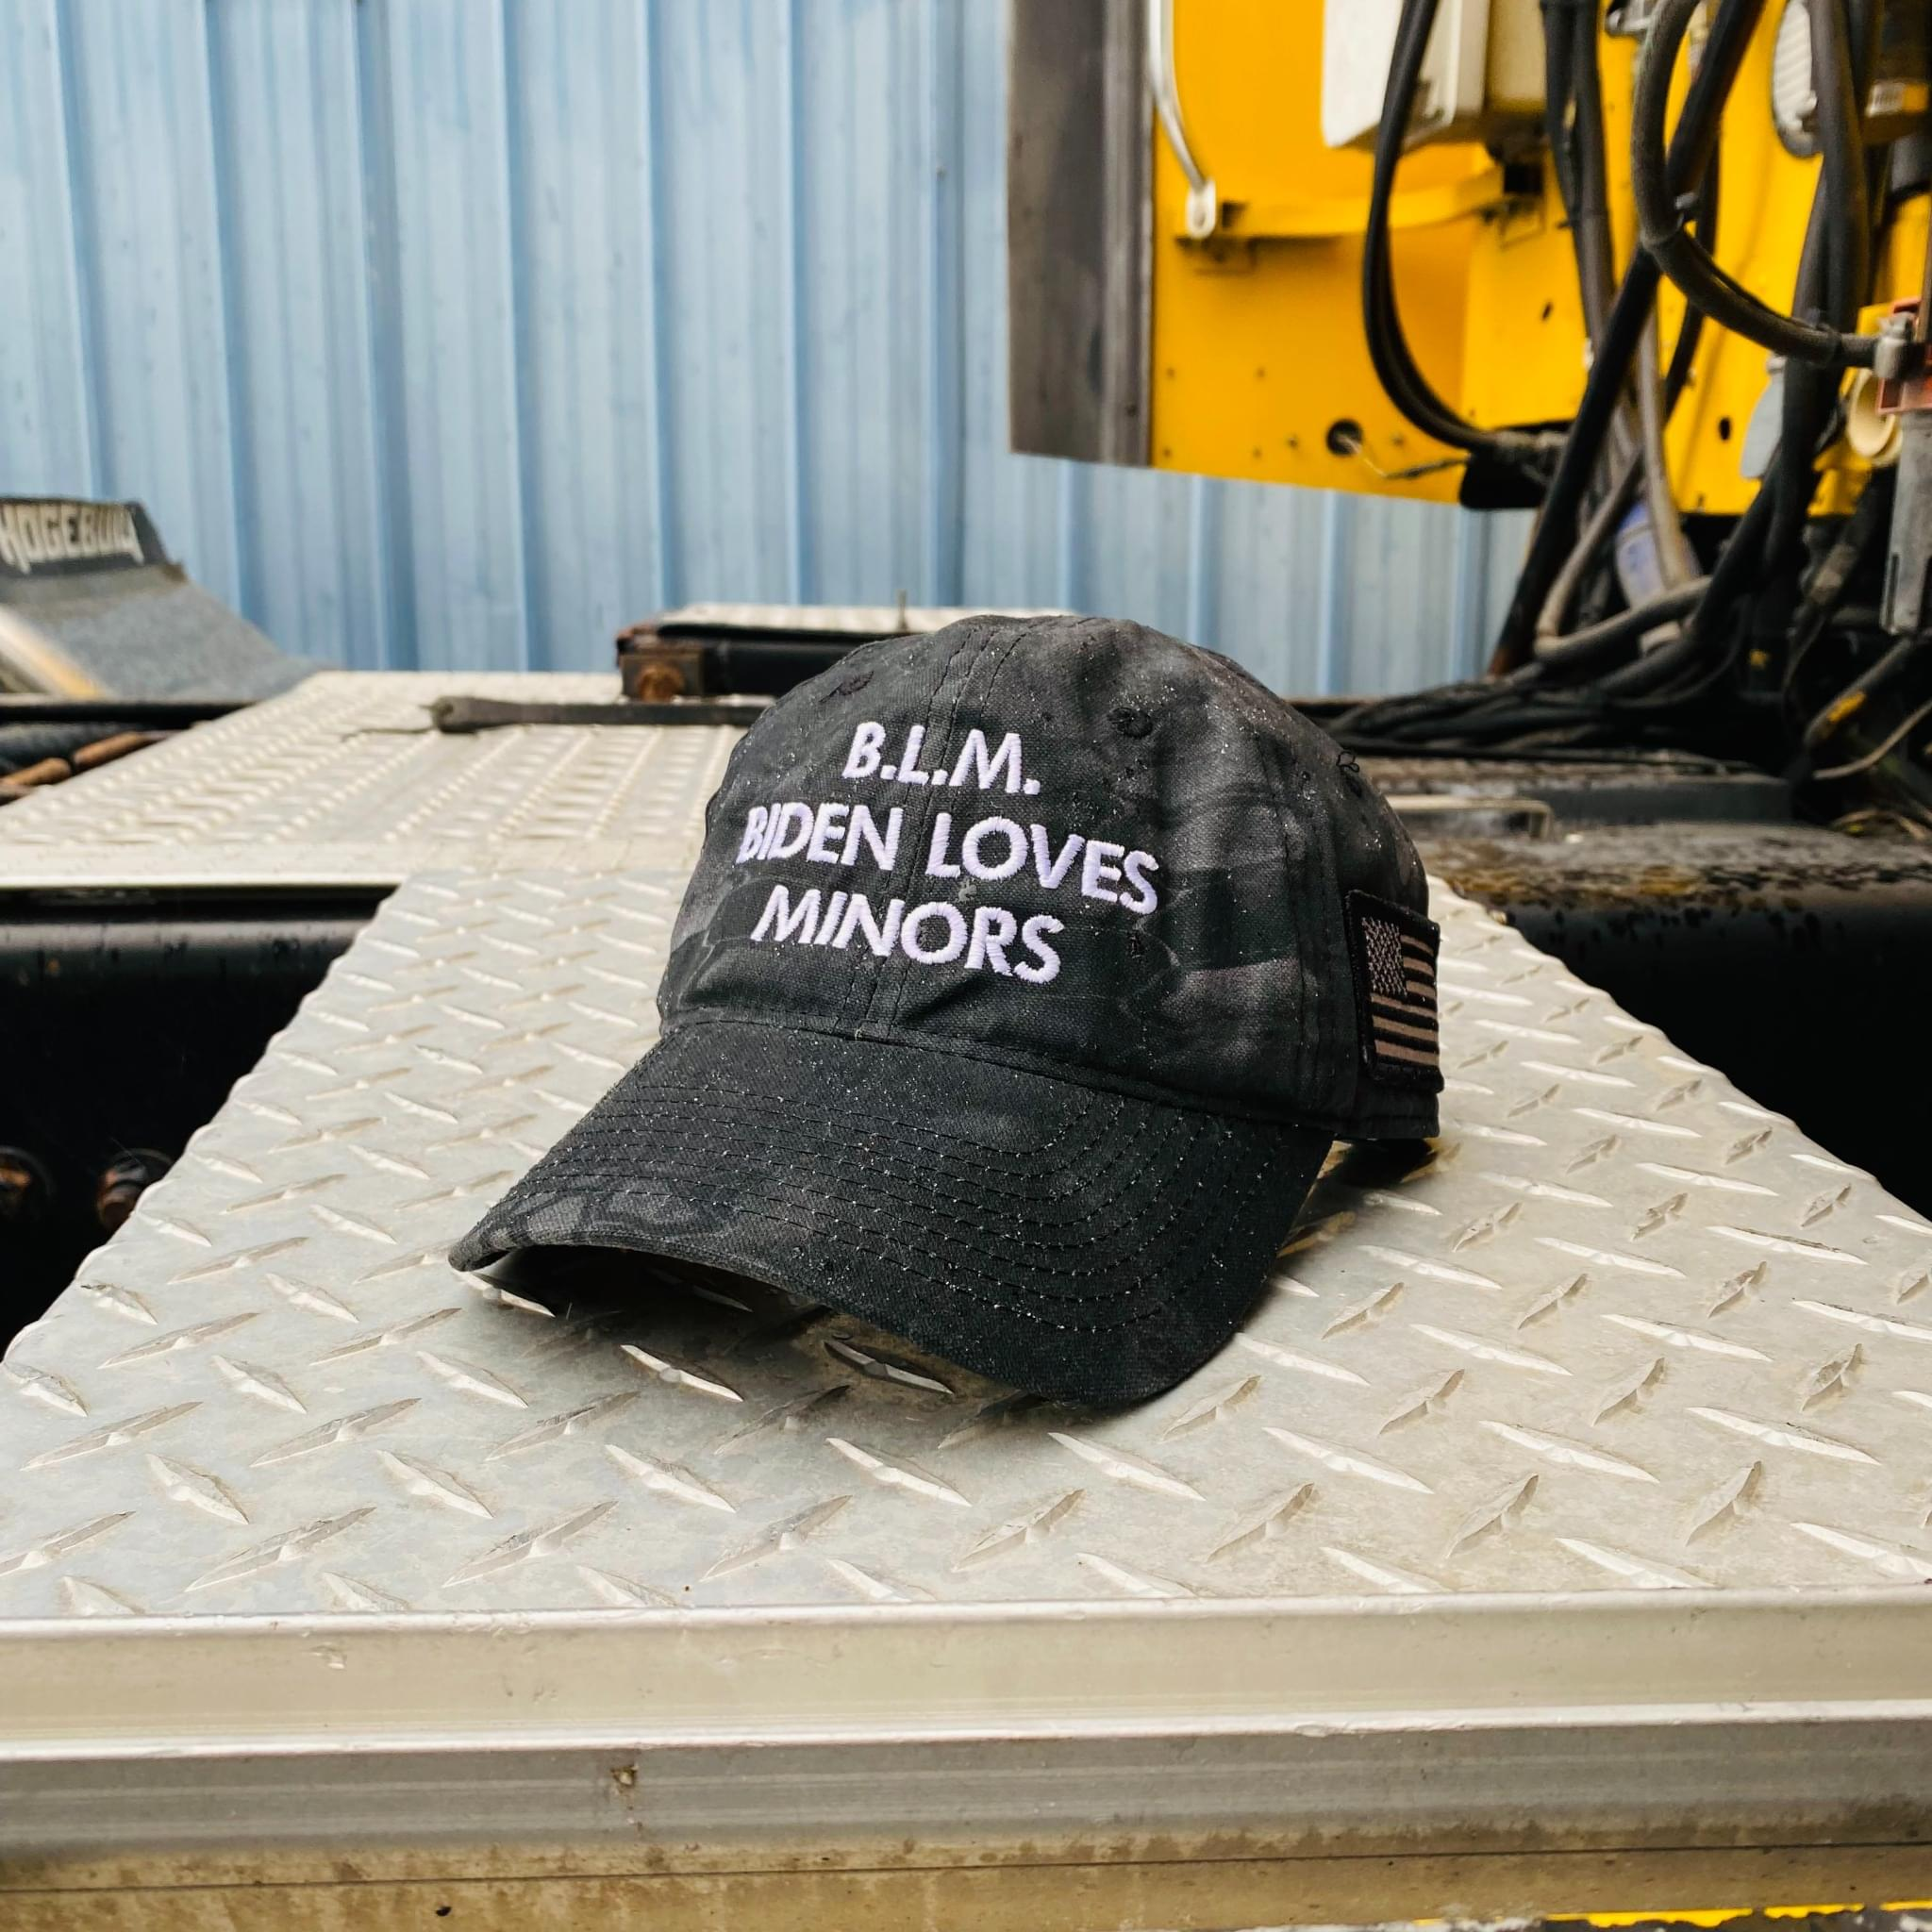 BLM Biden loves minors hat cap